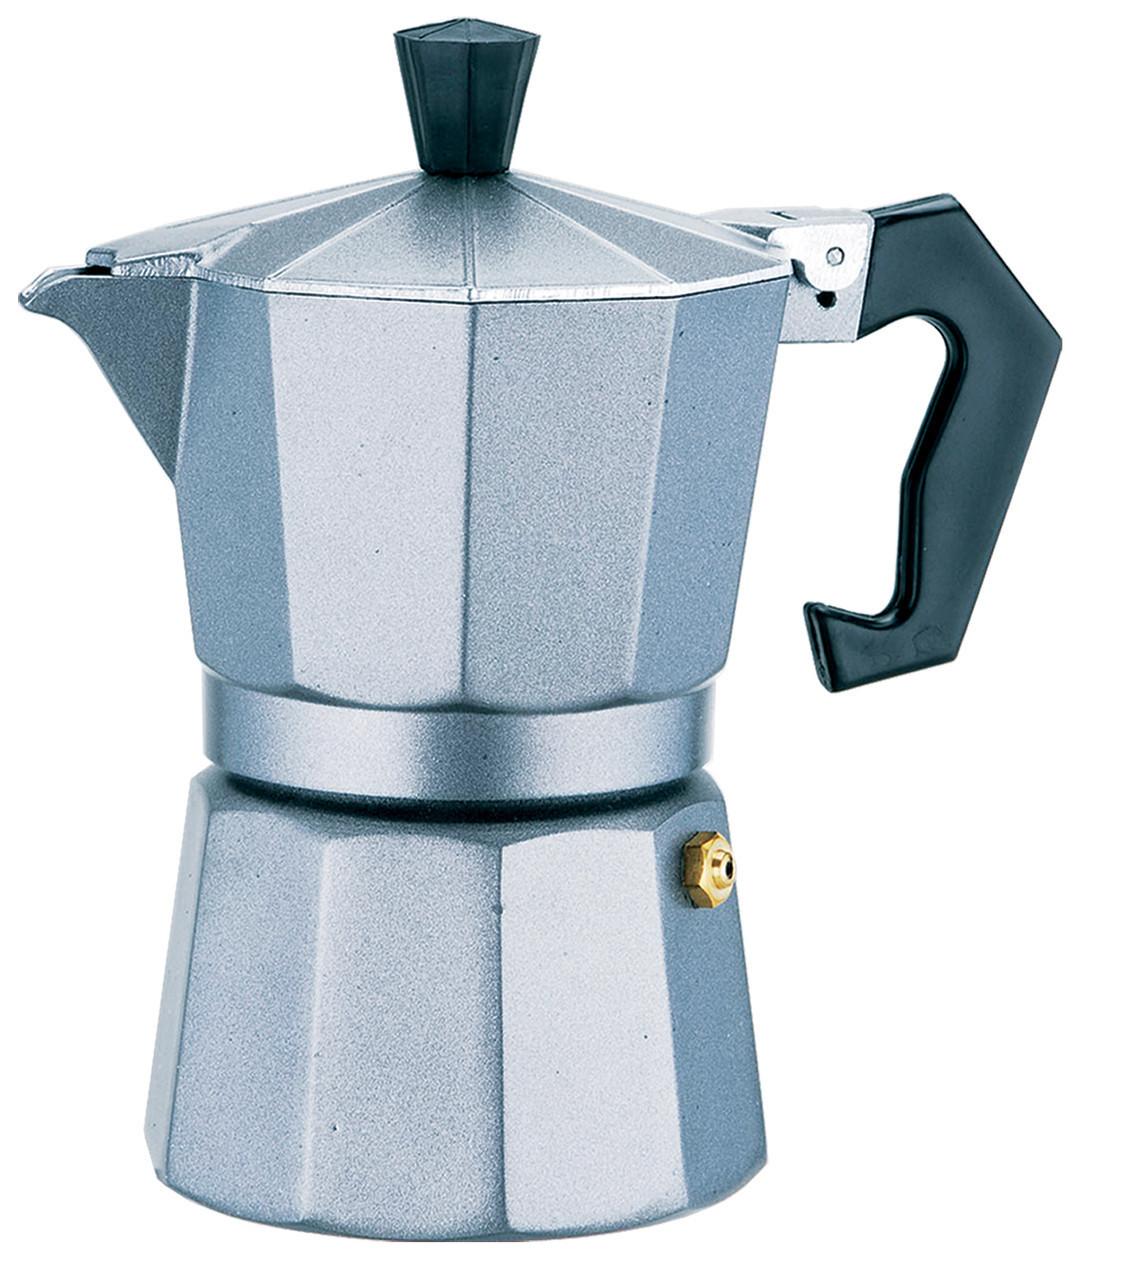 Гейзерная кофеварка на 6 чашек алюминий MR-1666-6